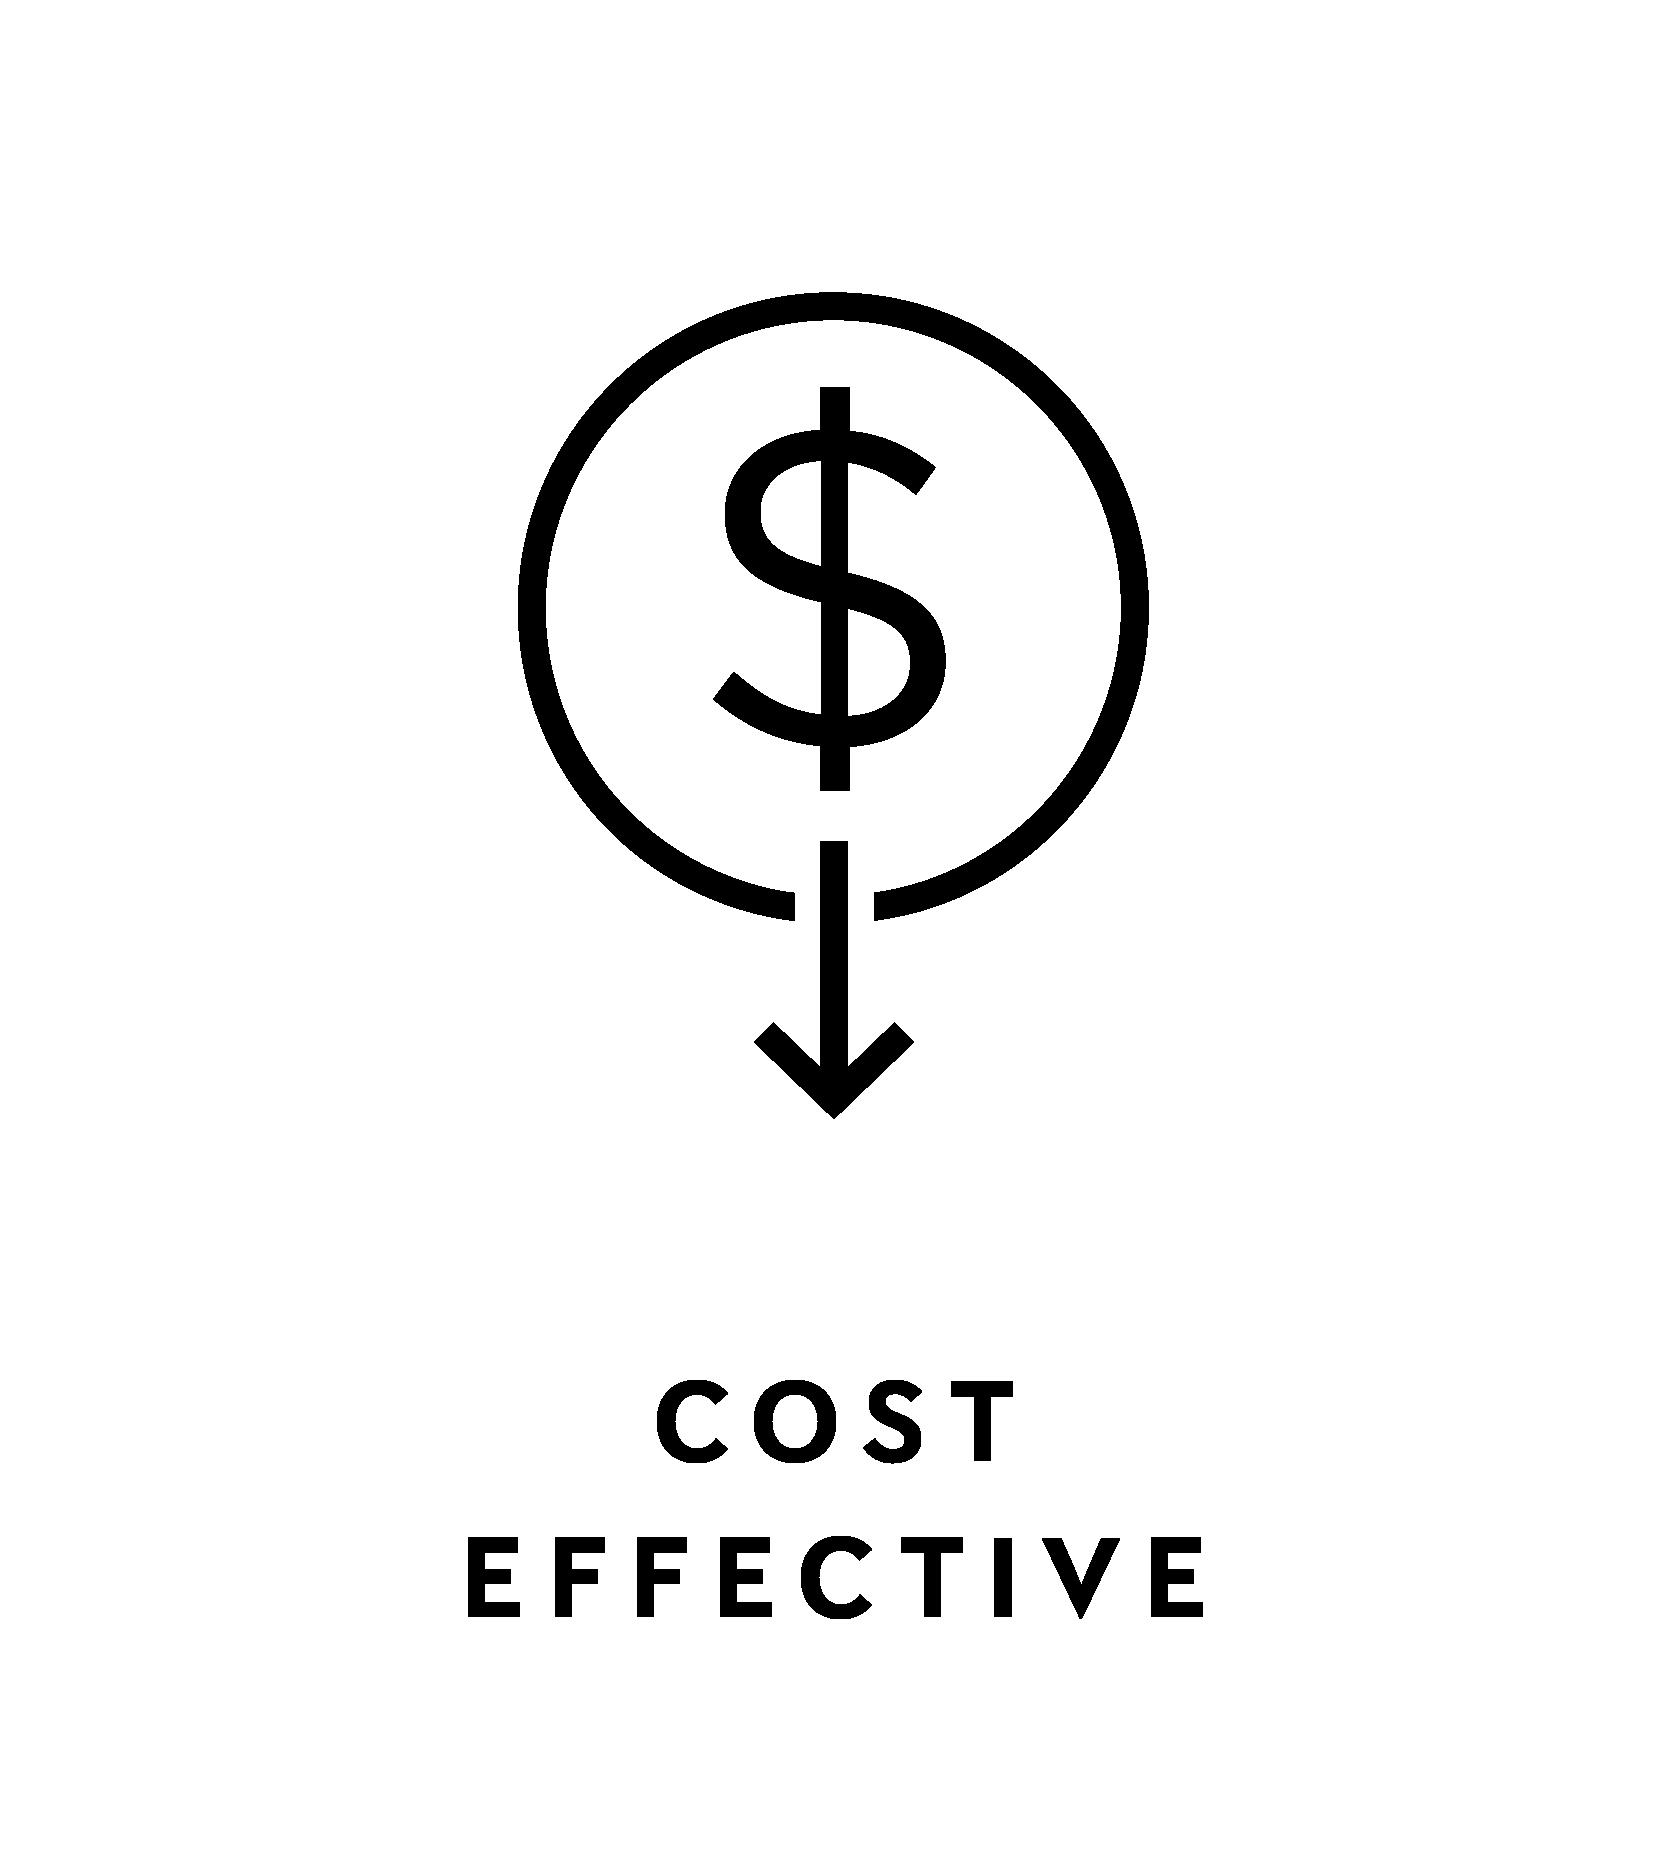 Cost Effective logo